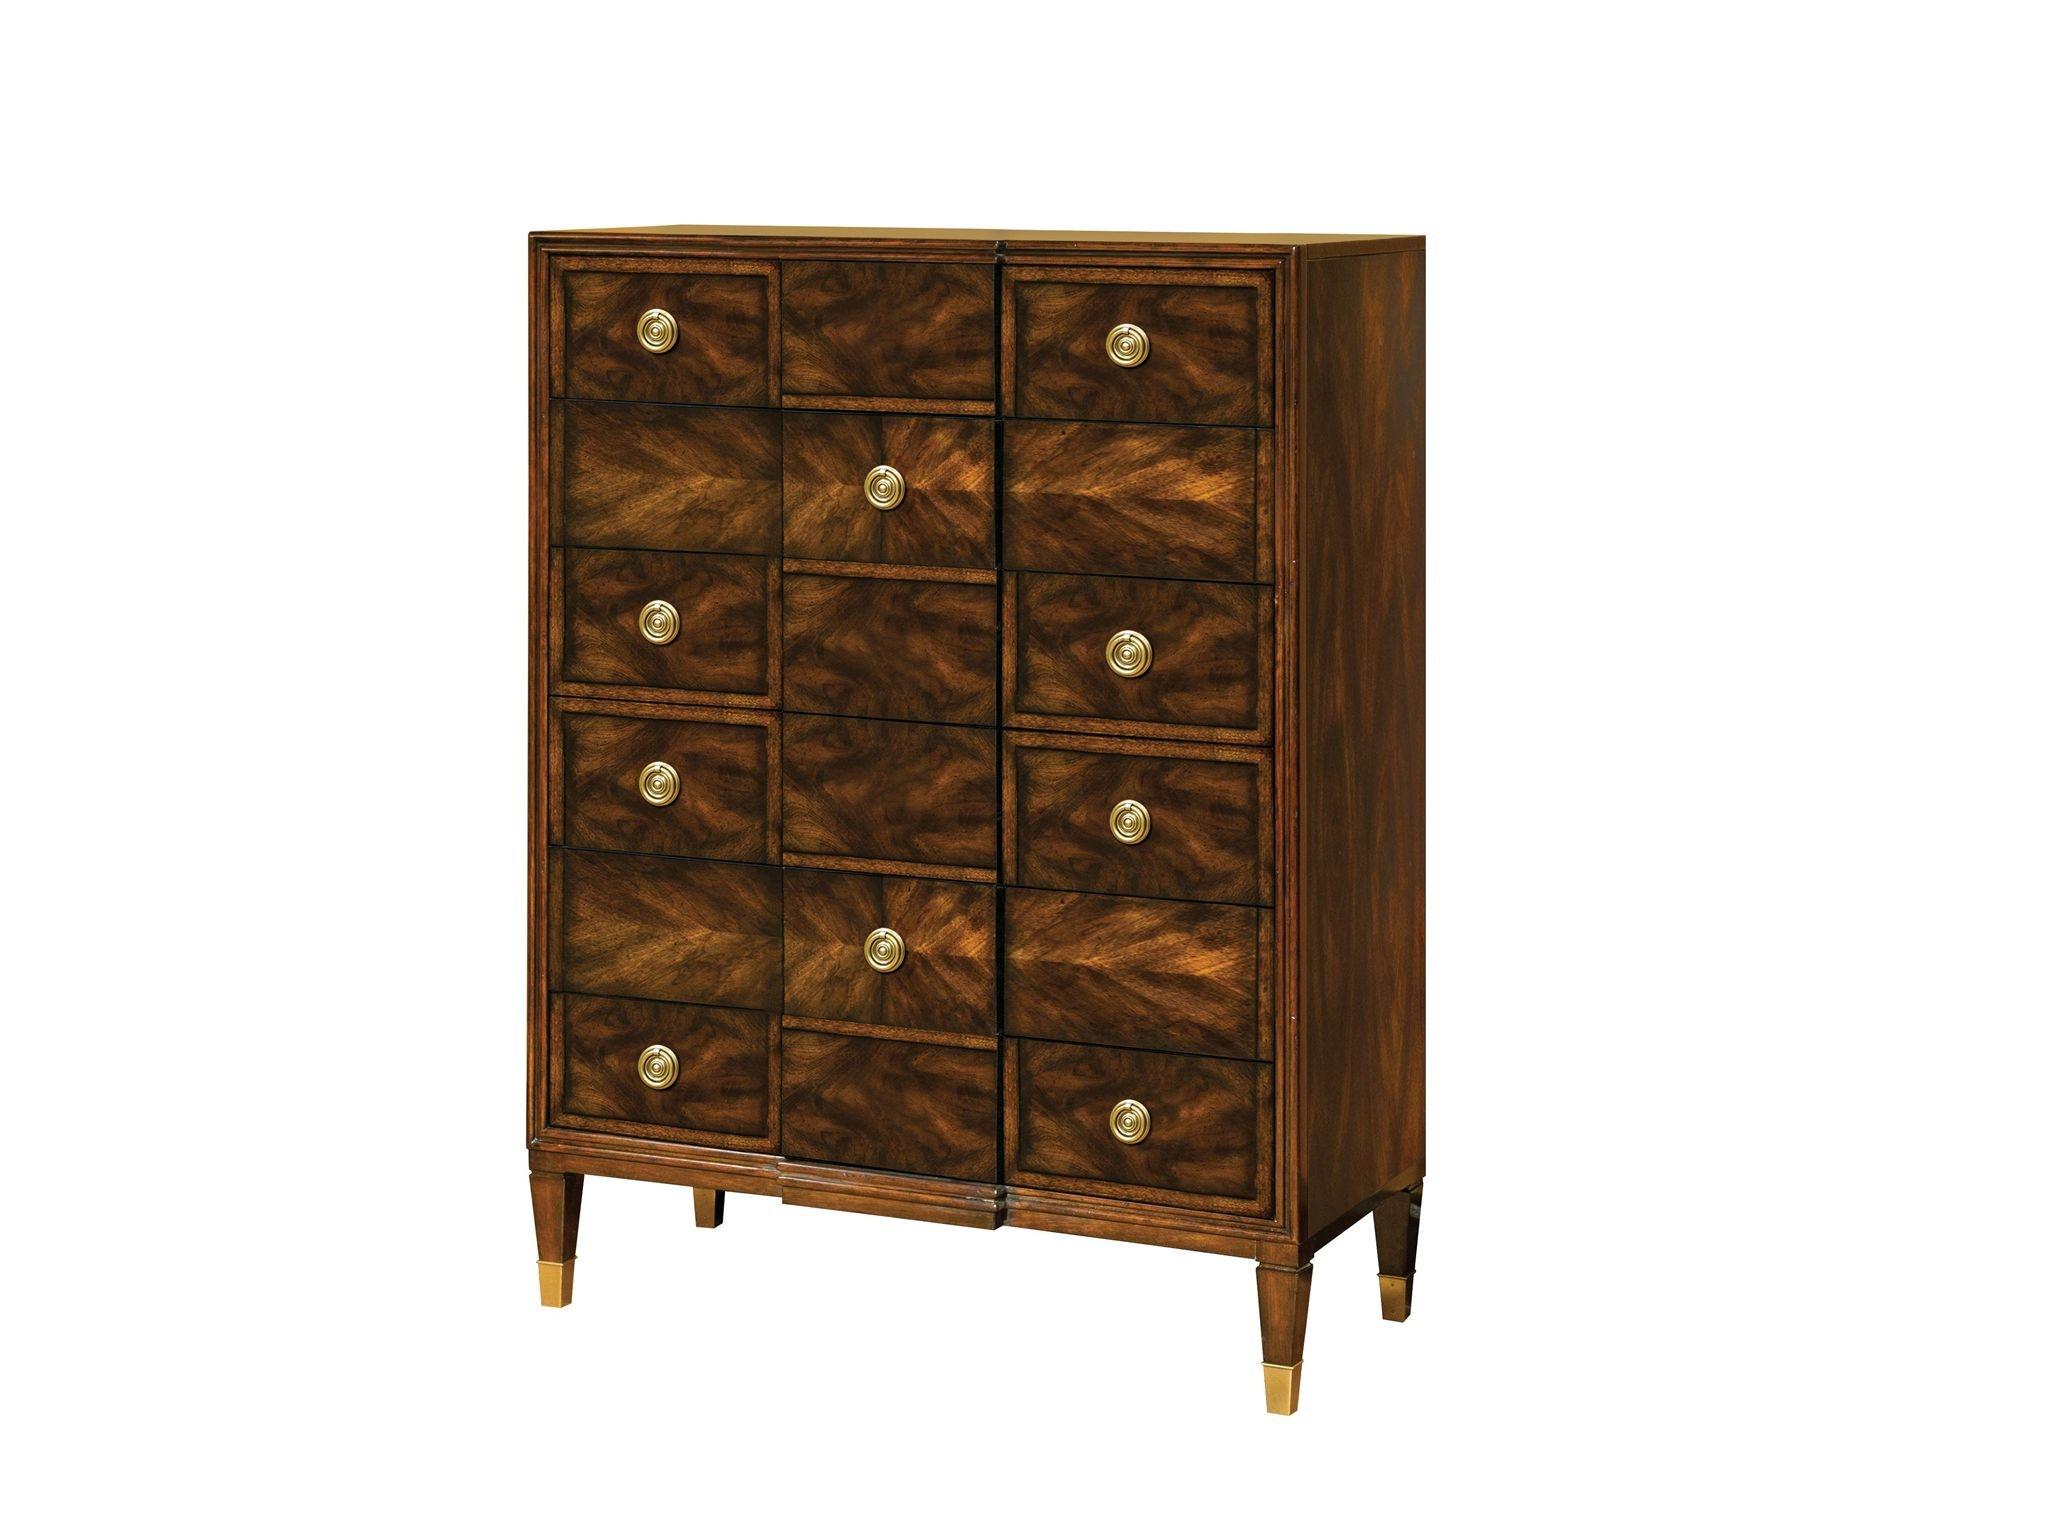 Fine Furniture Design Bedroom Bogies Bunching Chest 1427 112   Whitley  Furniture Galleries   Zebulon, NC